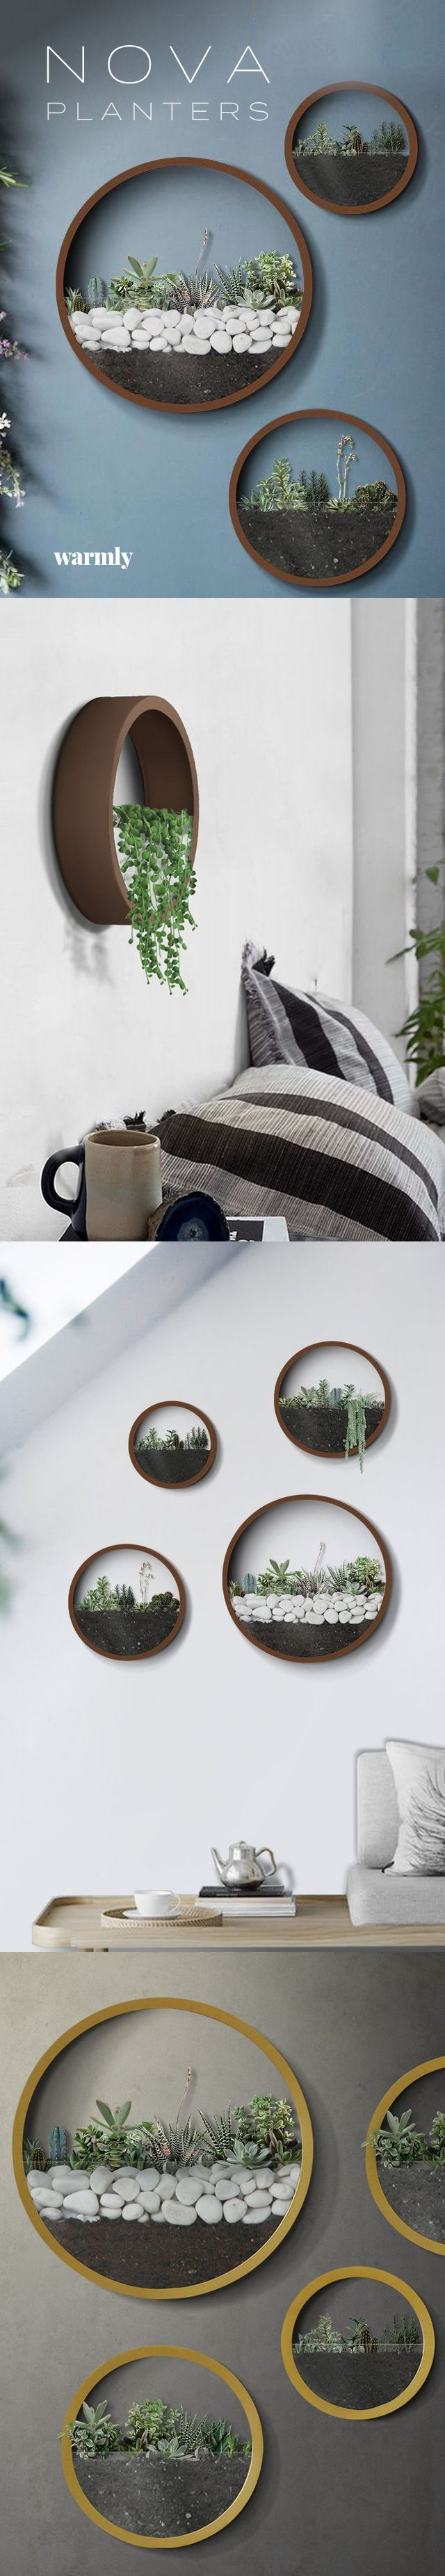 Nova – moderne nordische Wandvasen